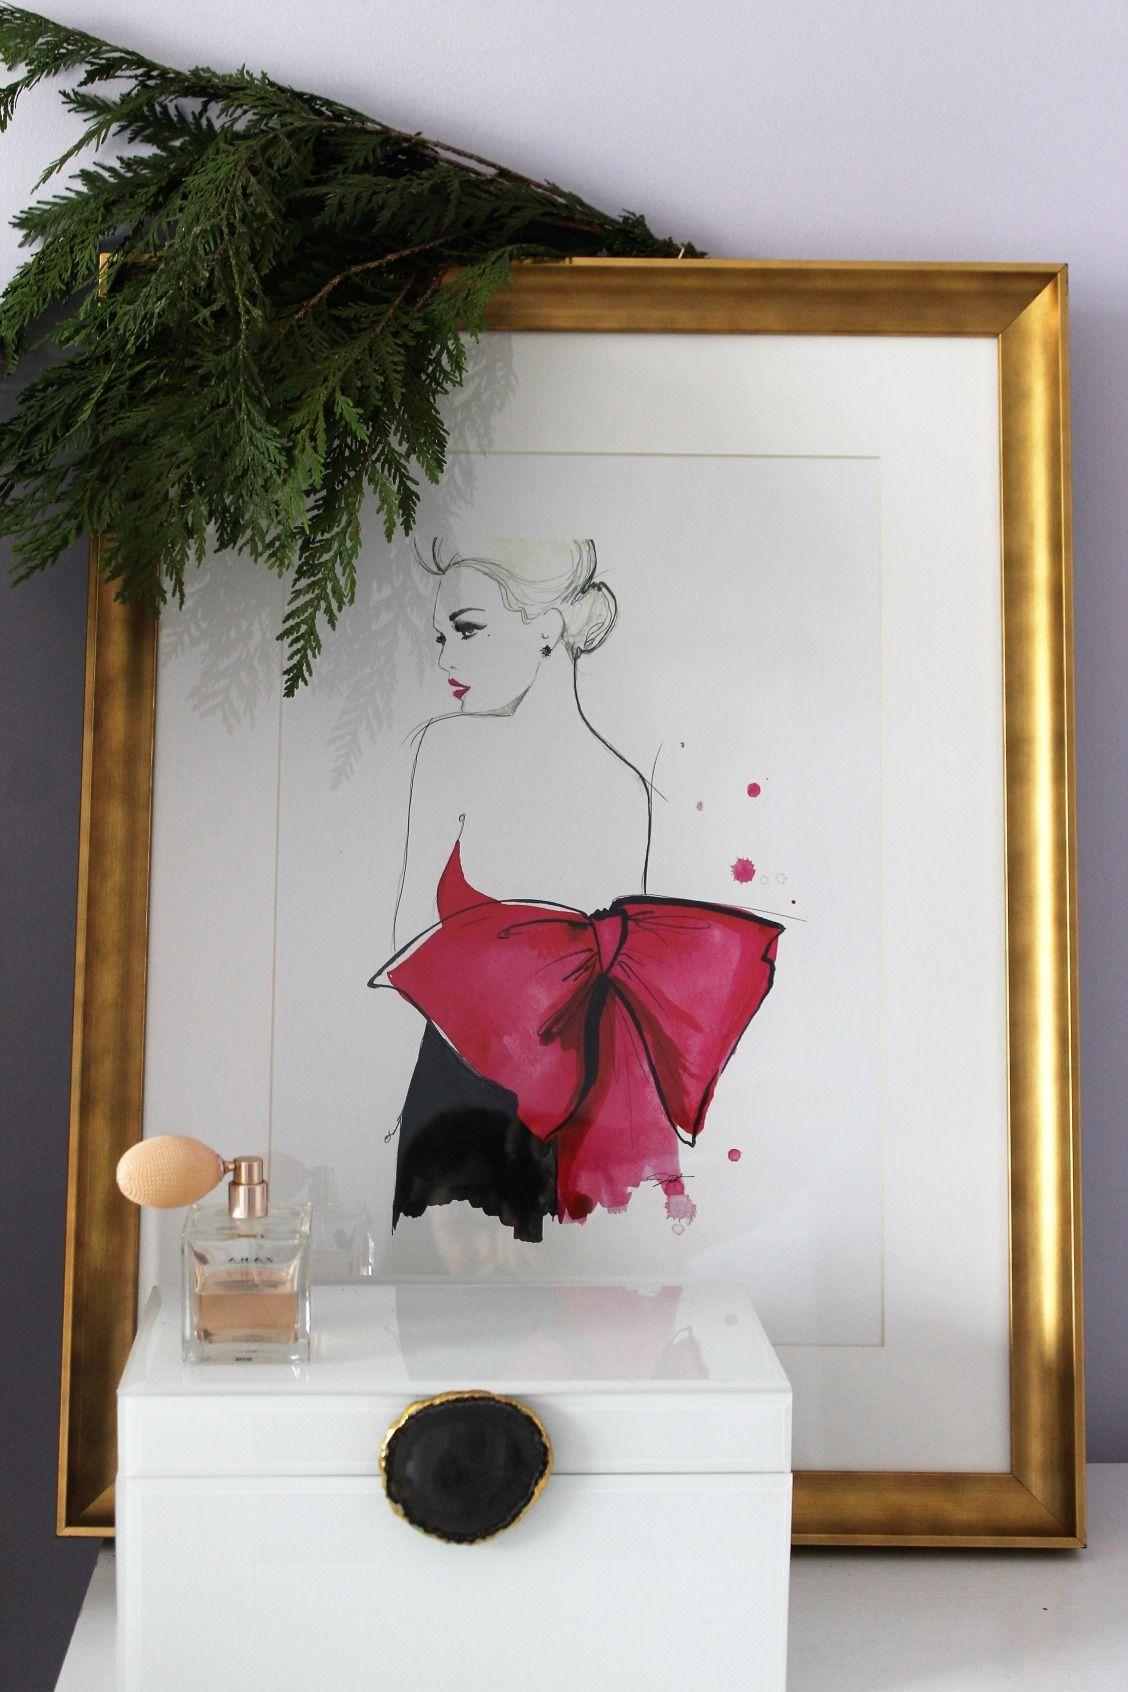 Listers Bedroom Furniture Z Lister Jwsinteriors Shares Her Guest Bedroom Decor Tips On